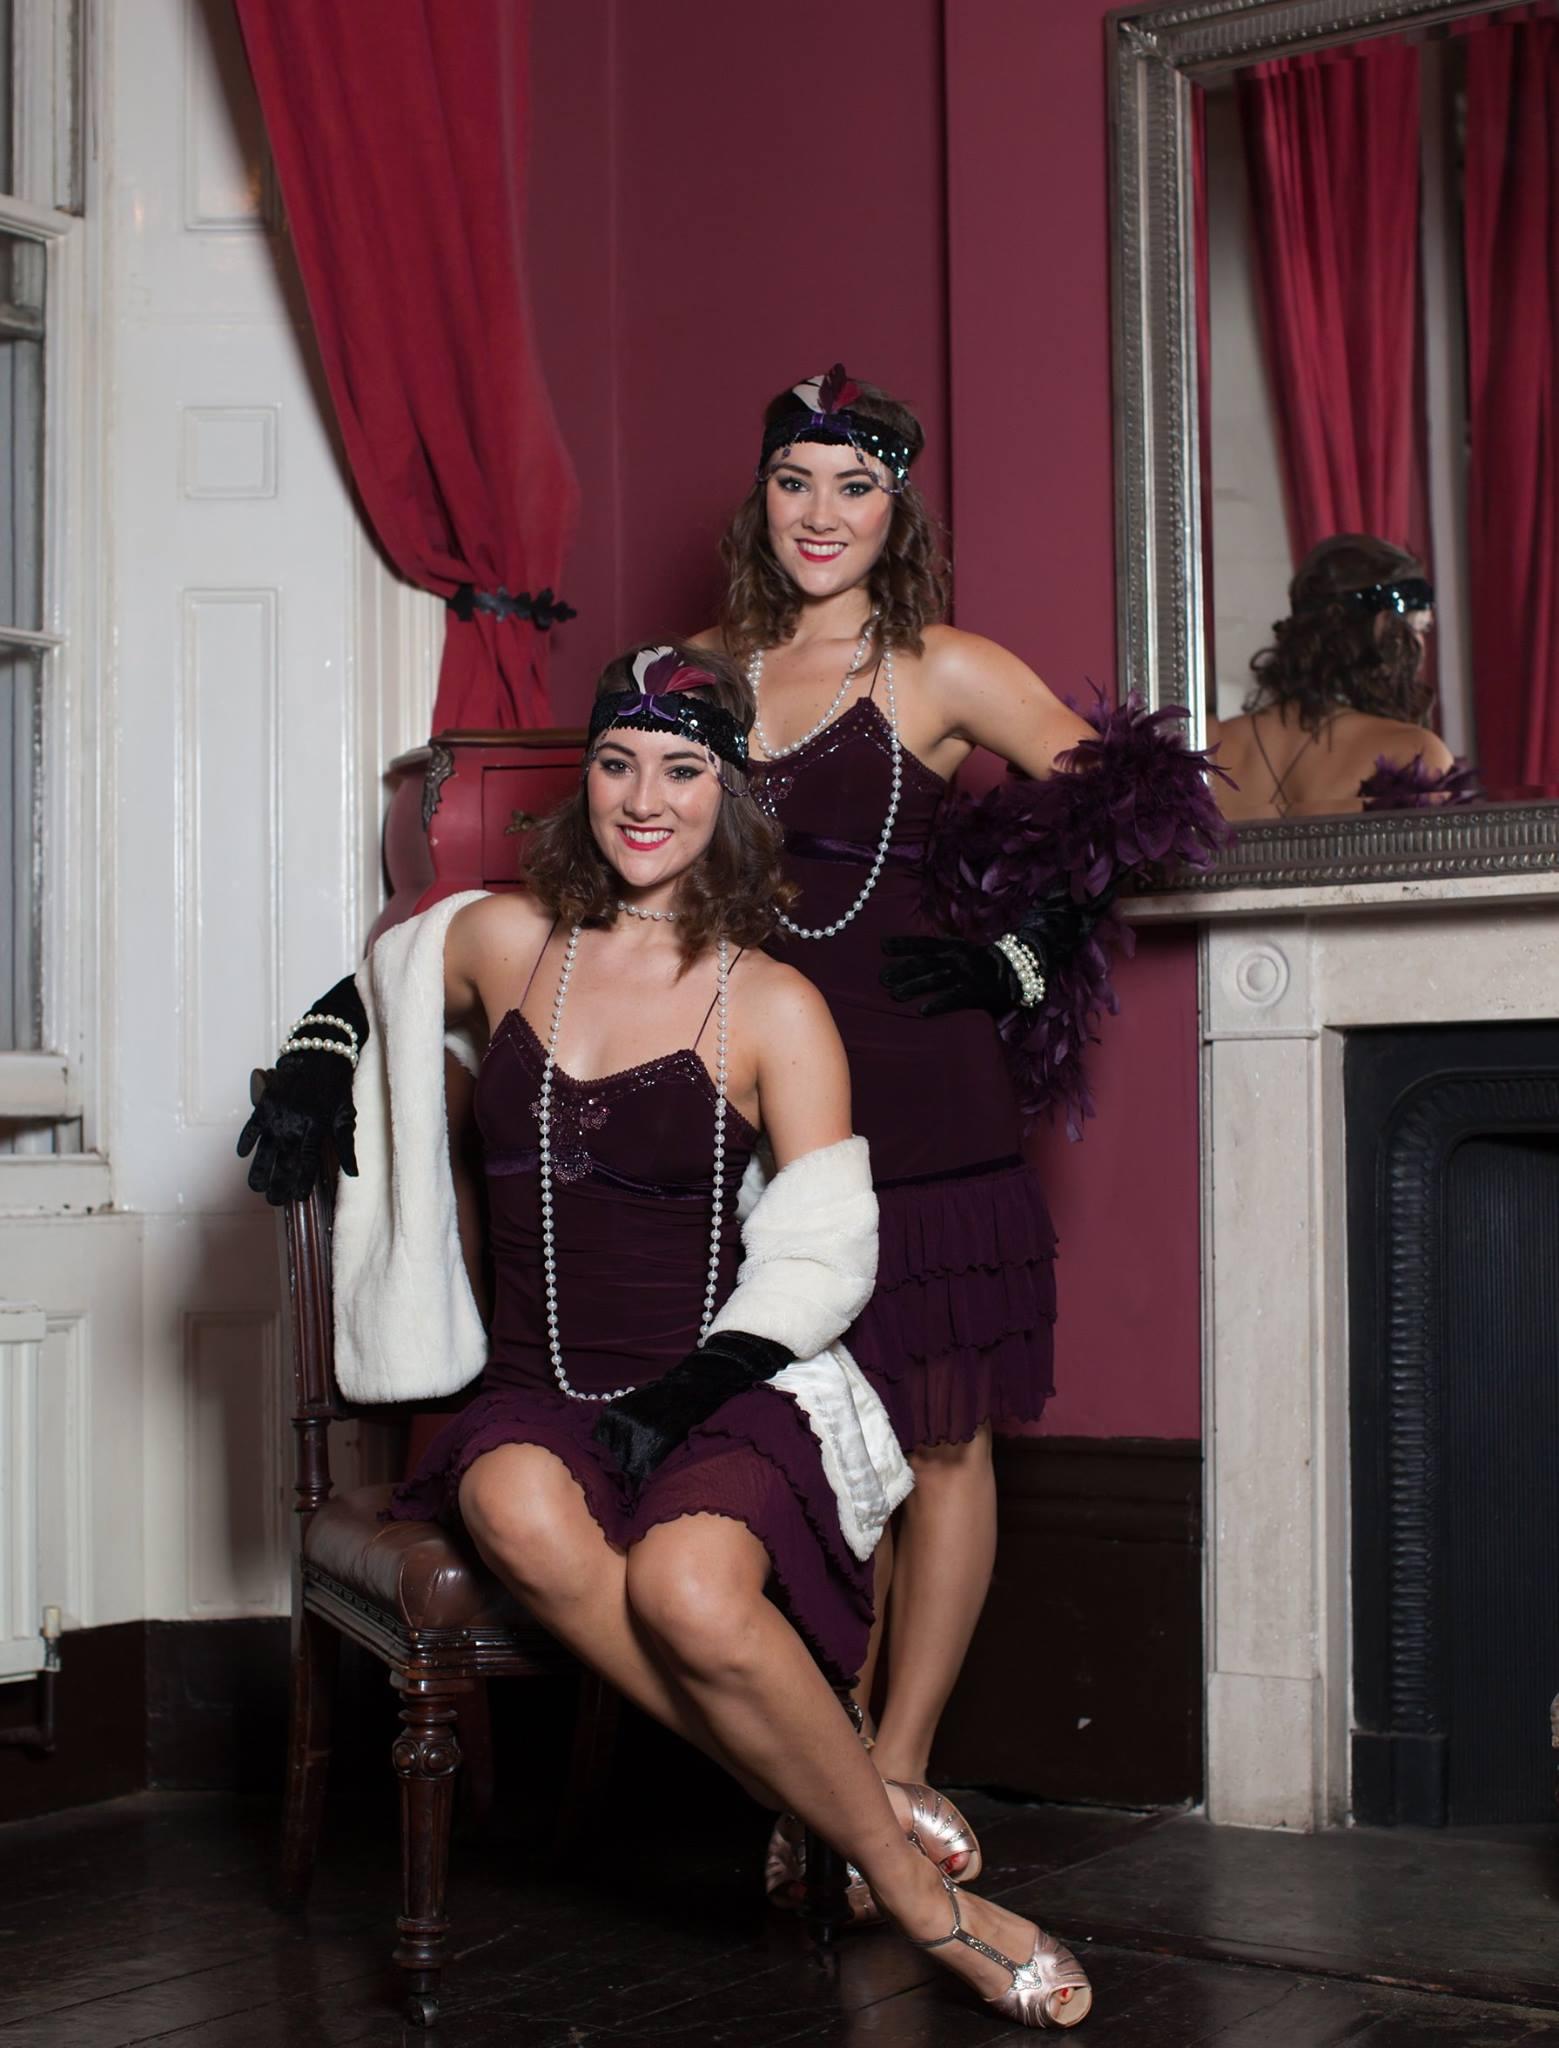 1920s-Swing-Dancers-71.jpg